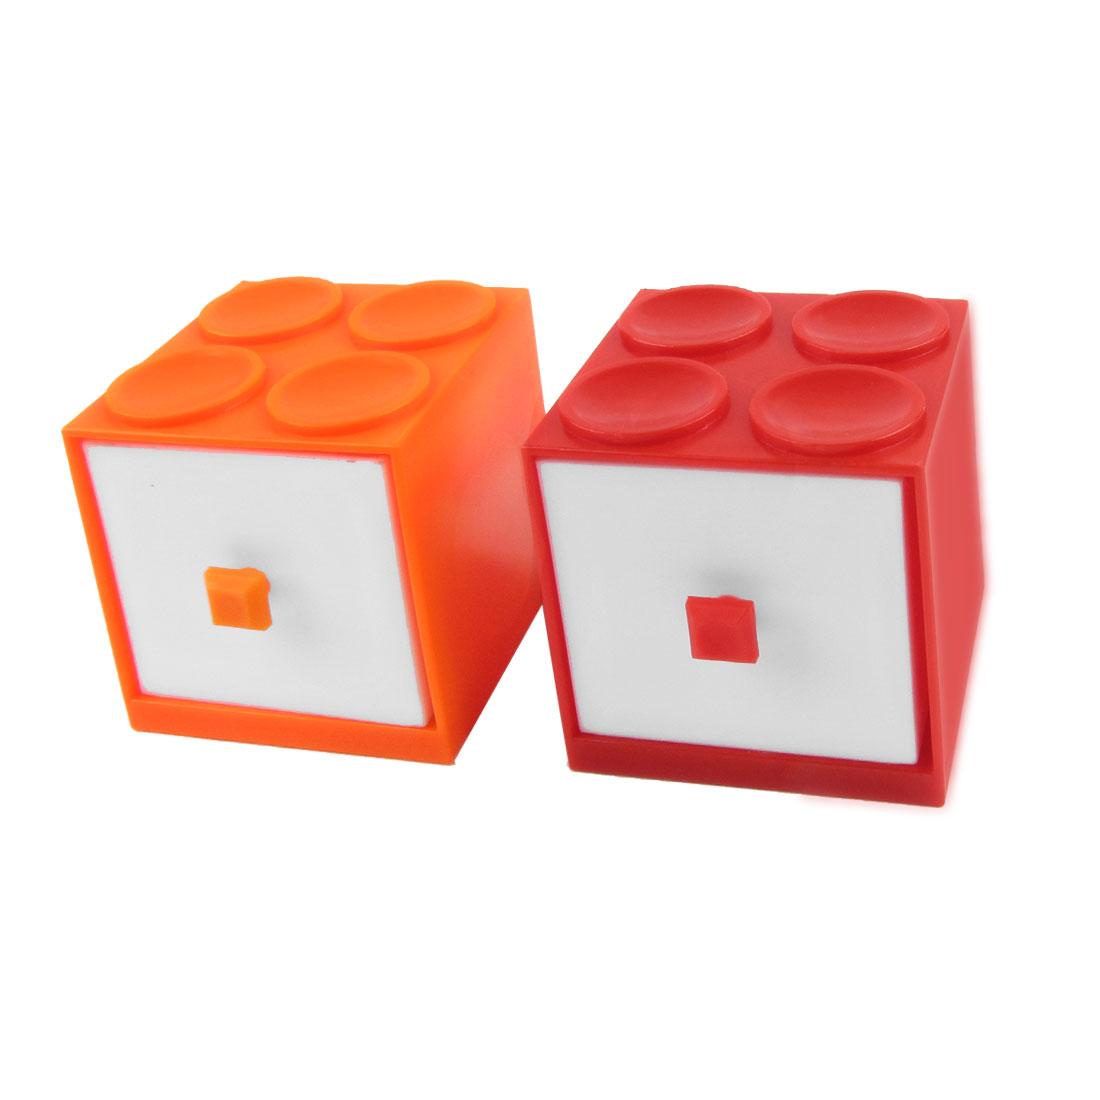 Orange Red Building Block Design 2 Layer Drawer Kits Storage Case Box Holder